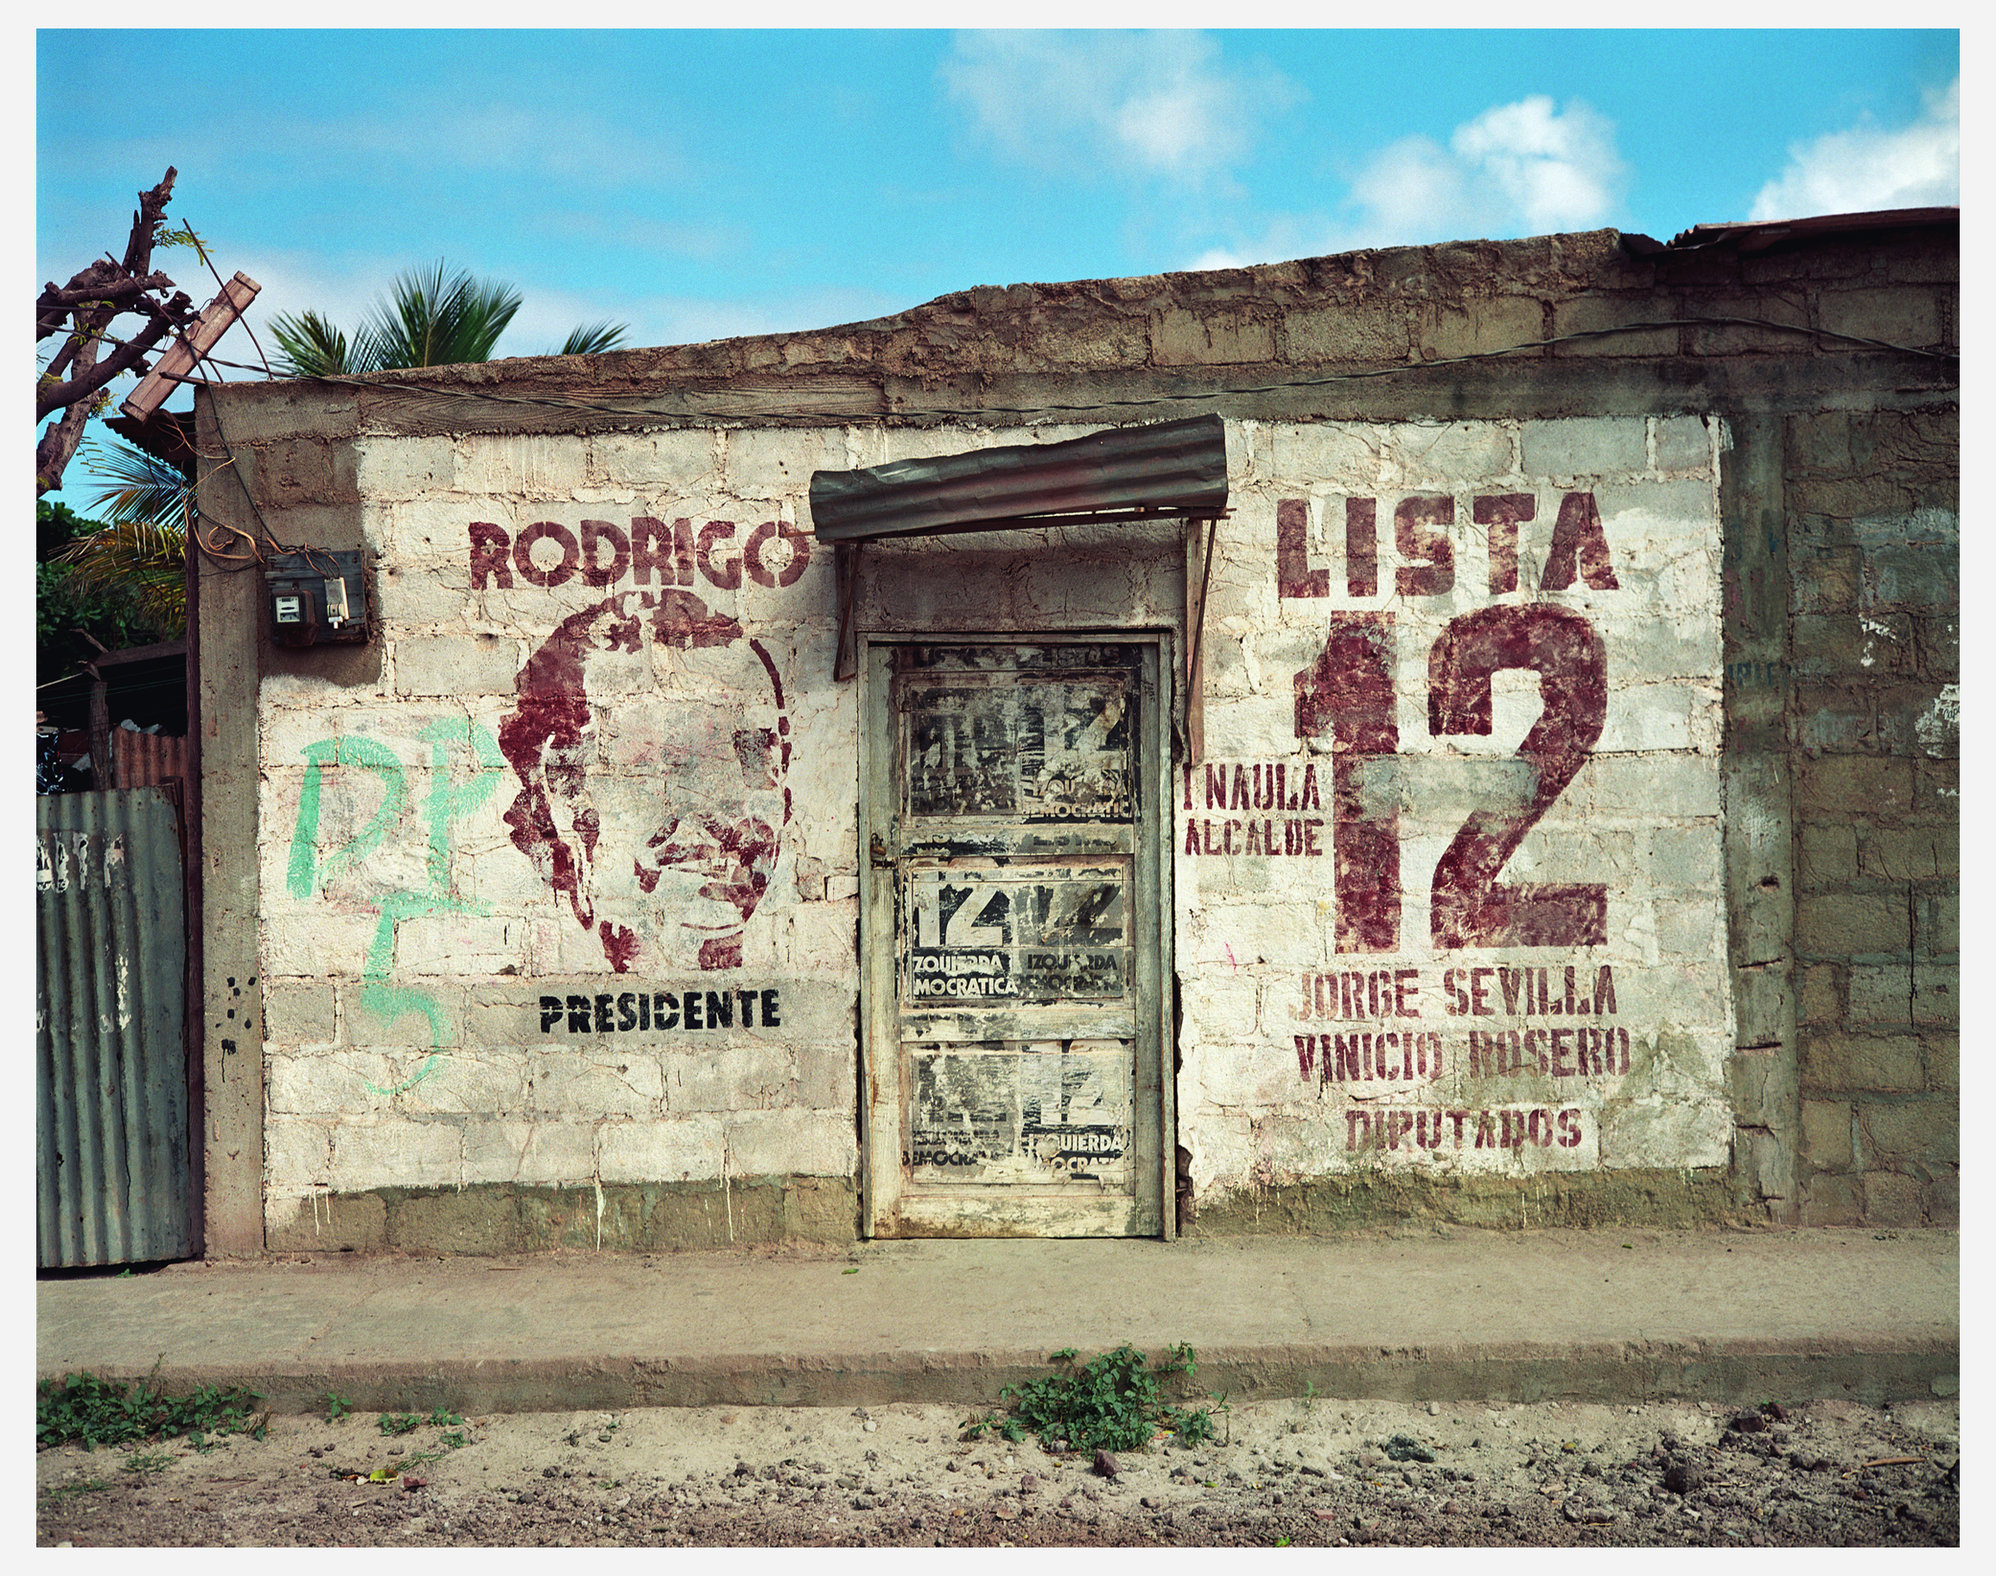 EWS  Galopagos Wall.jpg